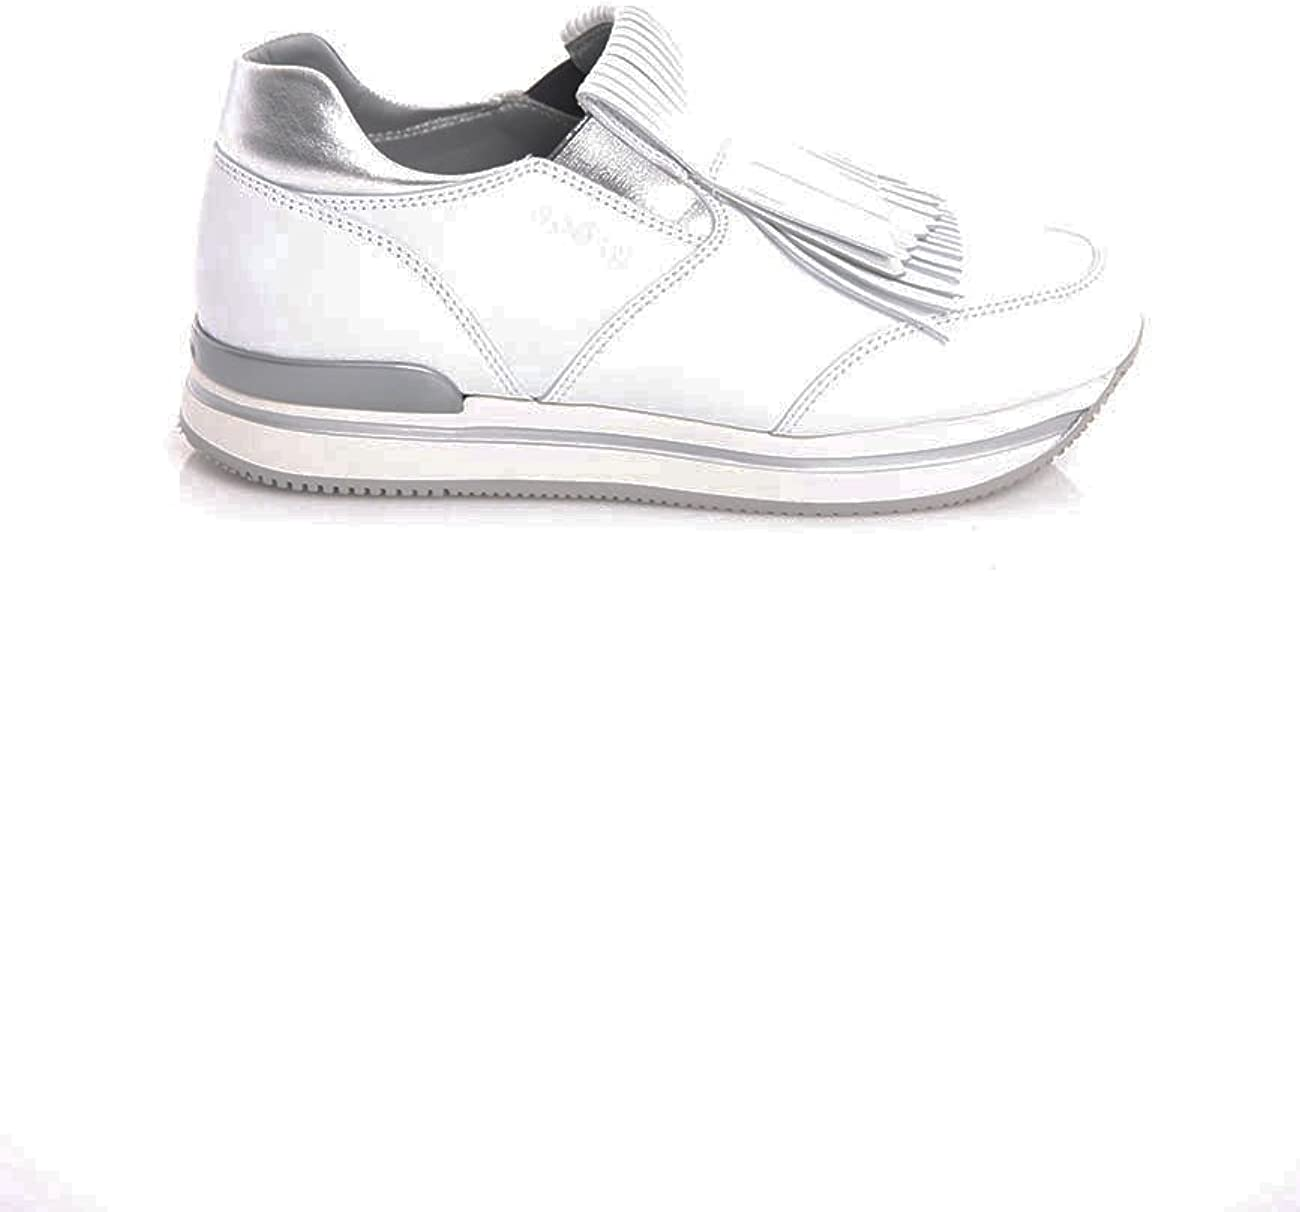 Hogan Sneakers H222 in Pelle Bianca con Frange, Donna, Taglia 38 ...